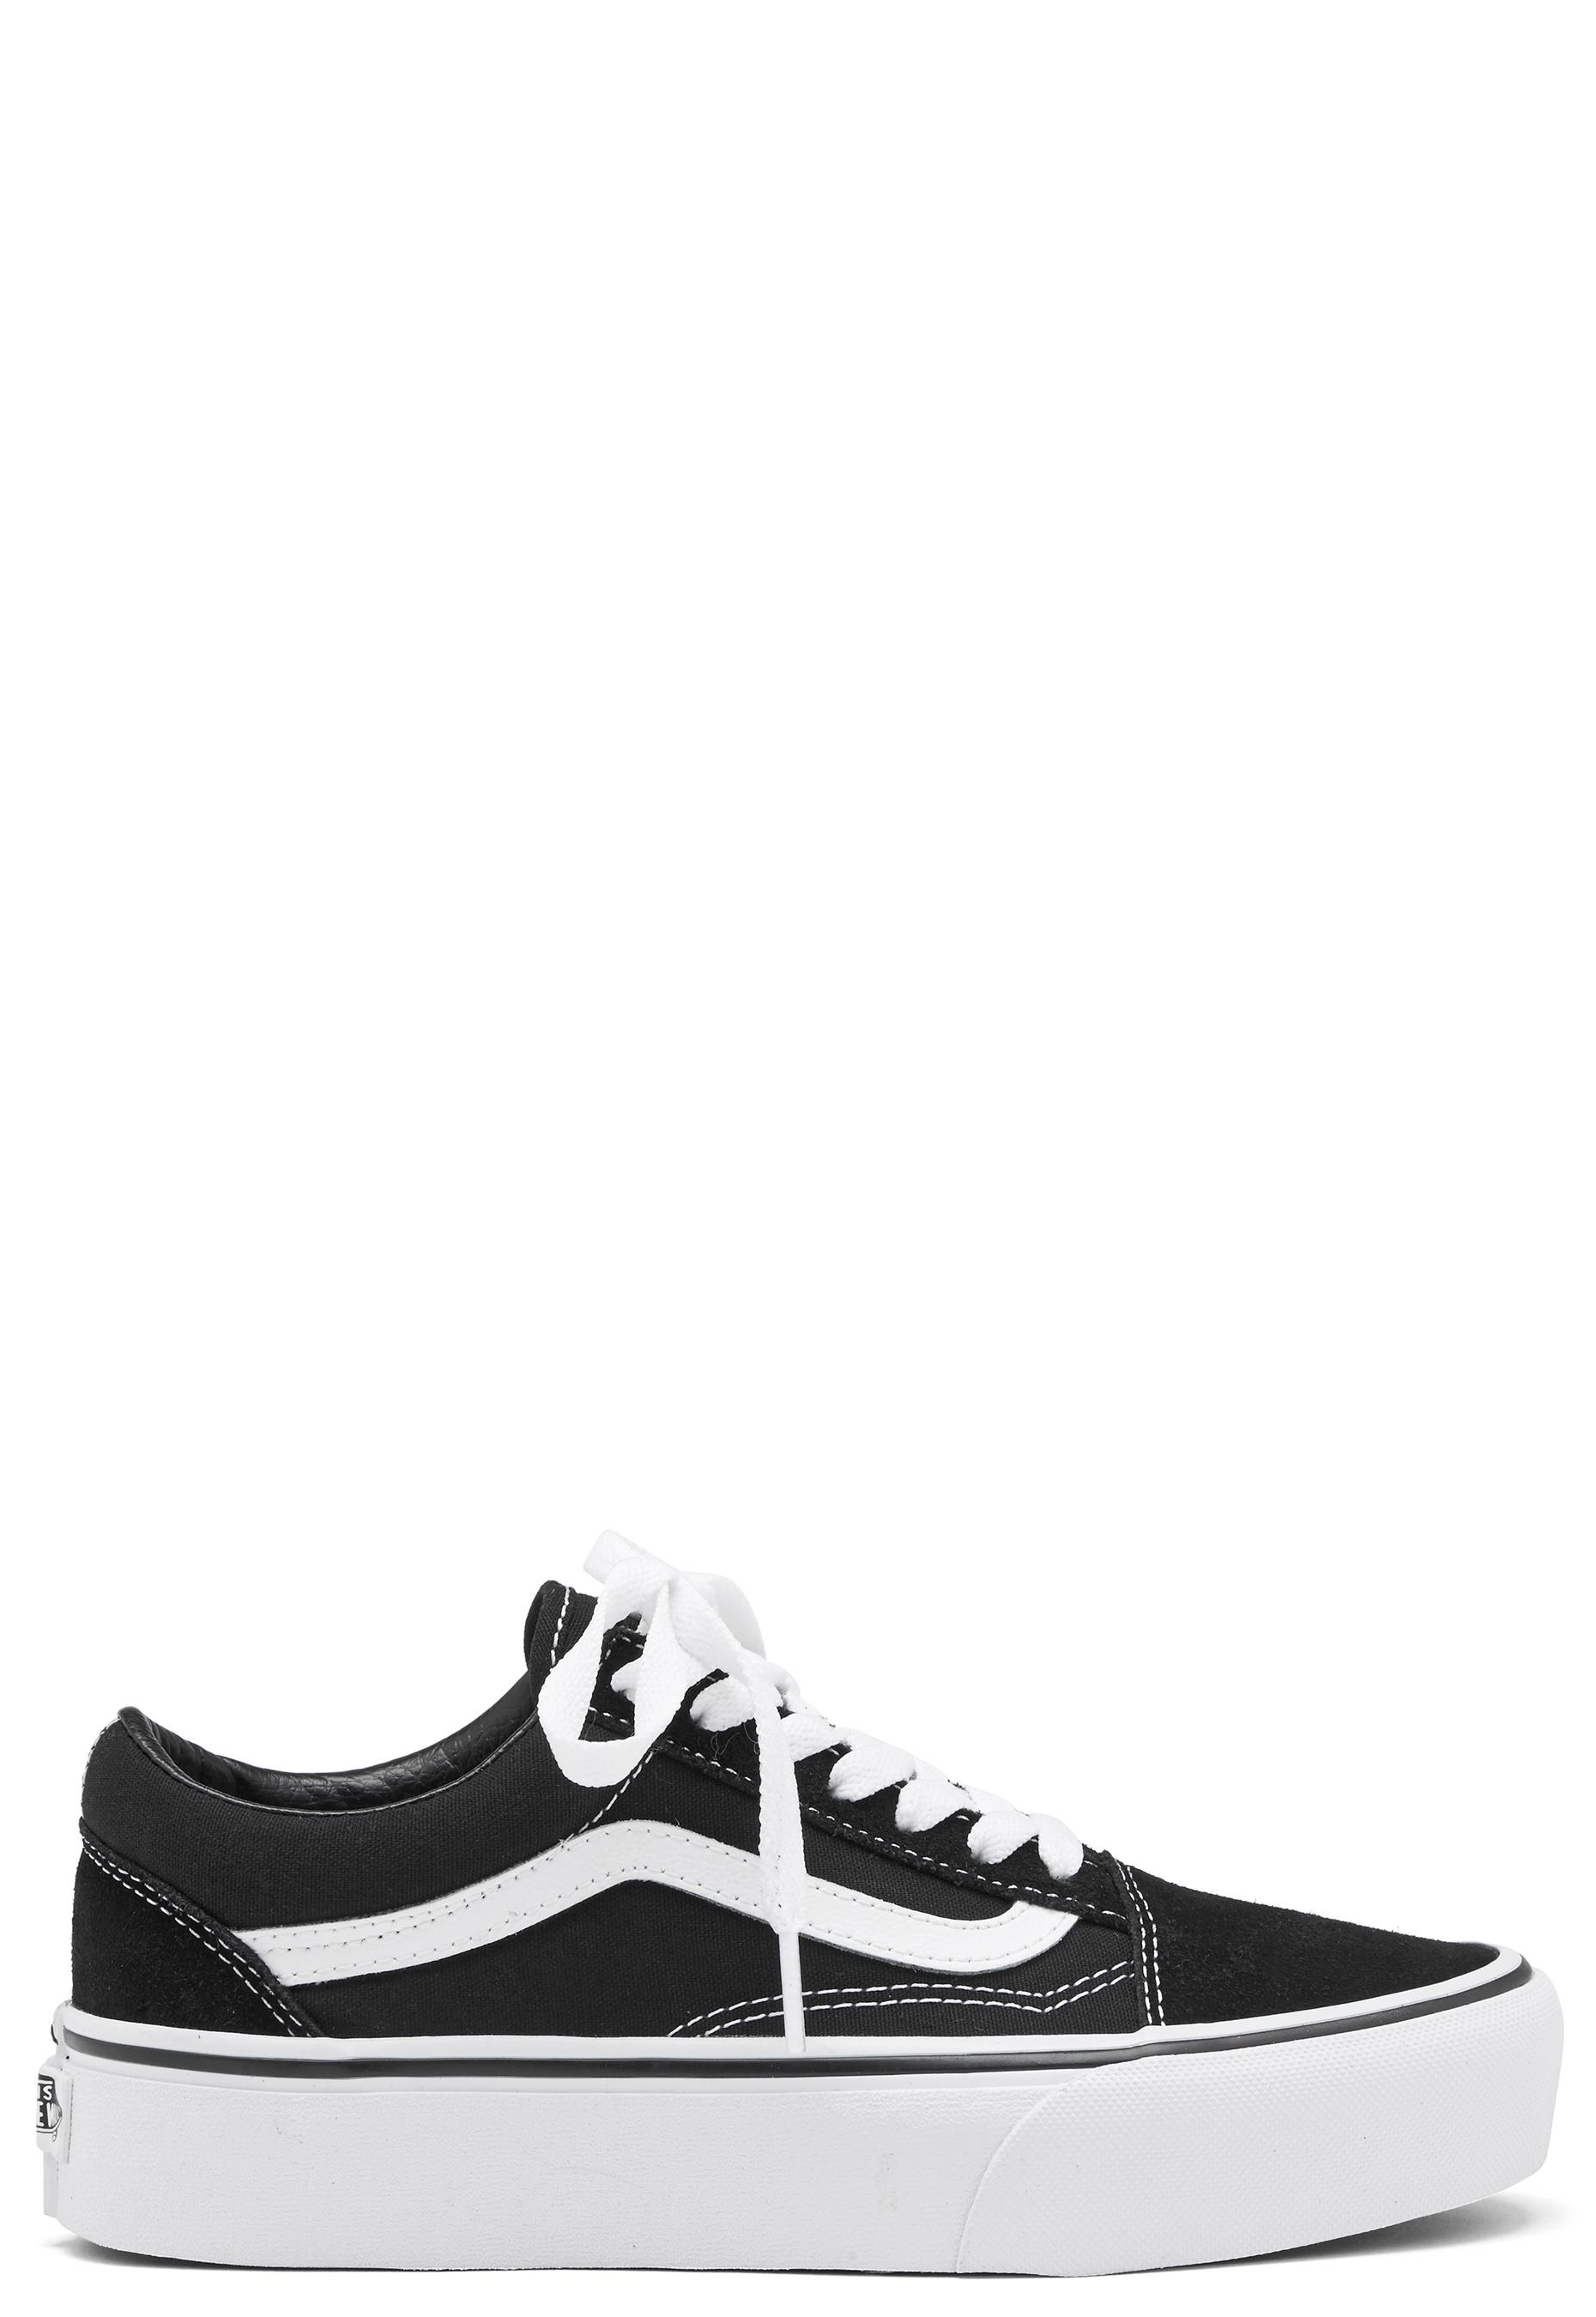 94371666b48a Vans Old Skool Platform Black White - Bubbleroom